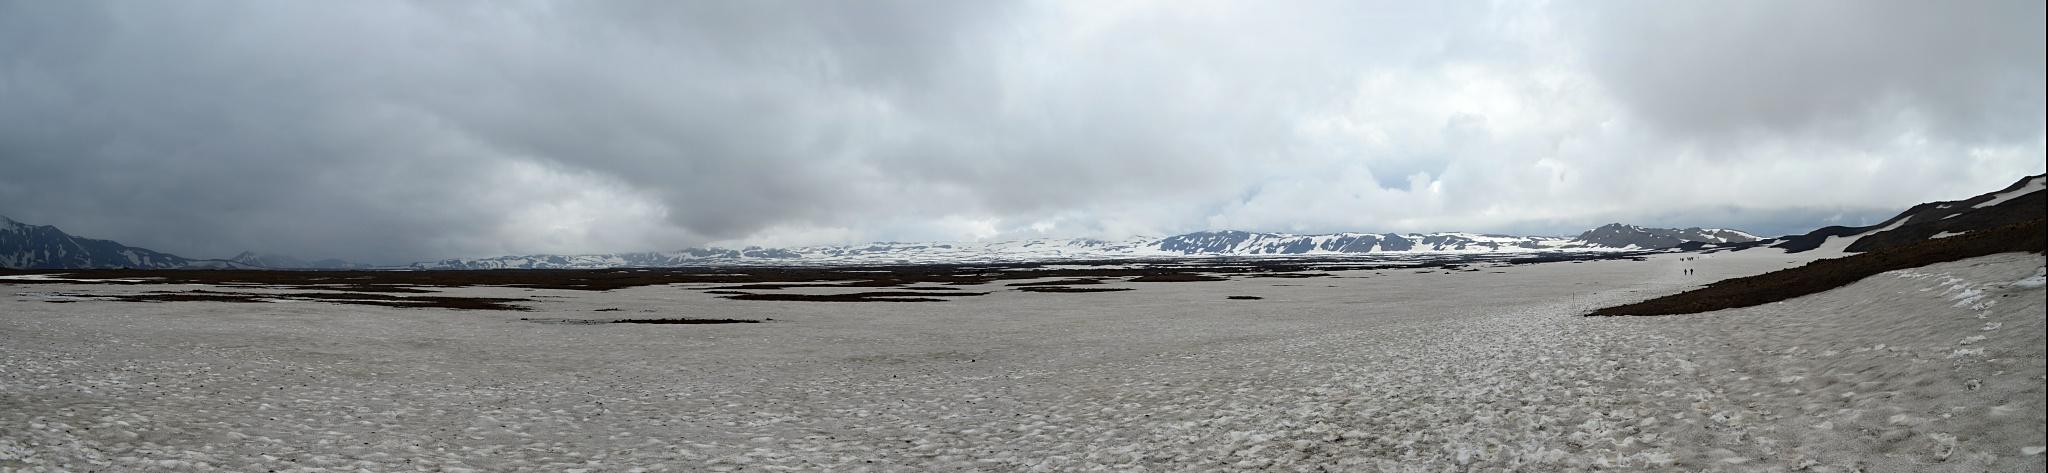 Panorama kráteru Askji